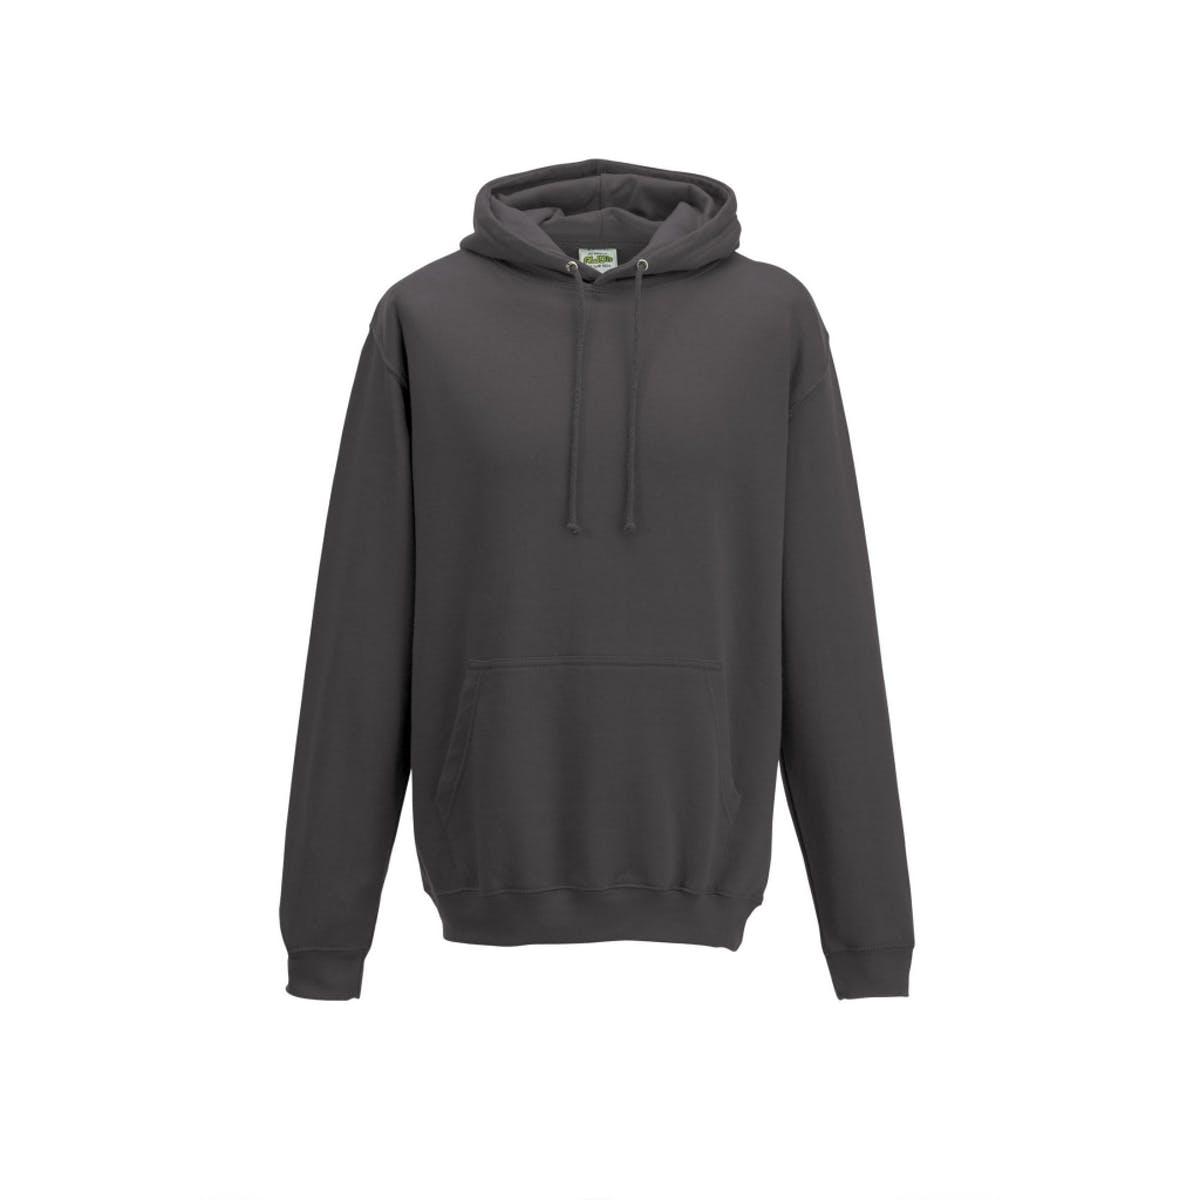 charcoal college hoodies